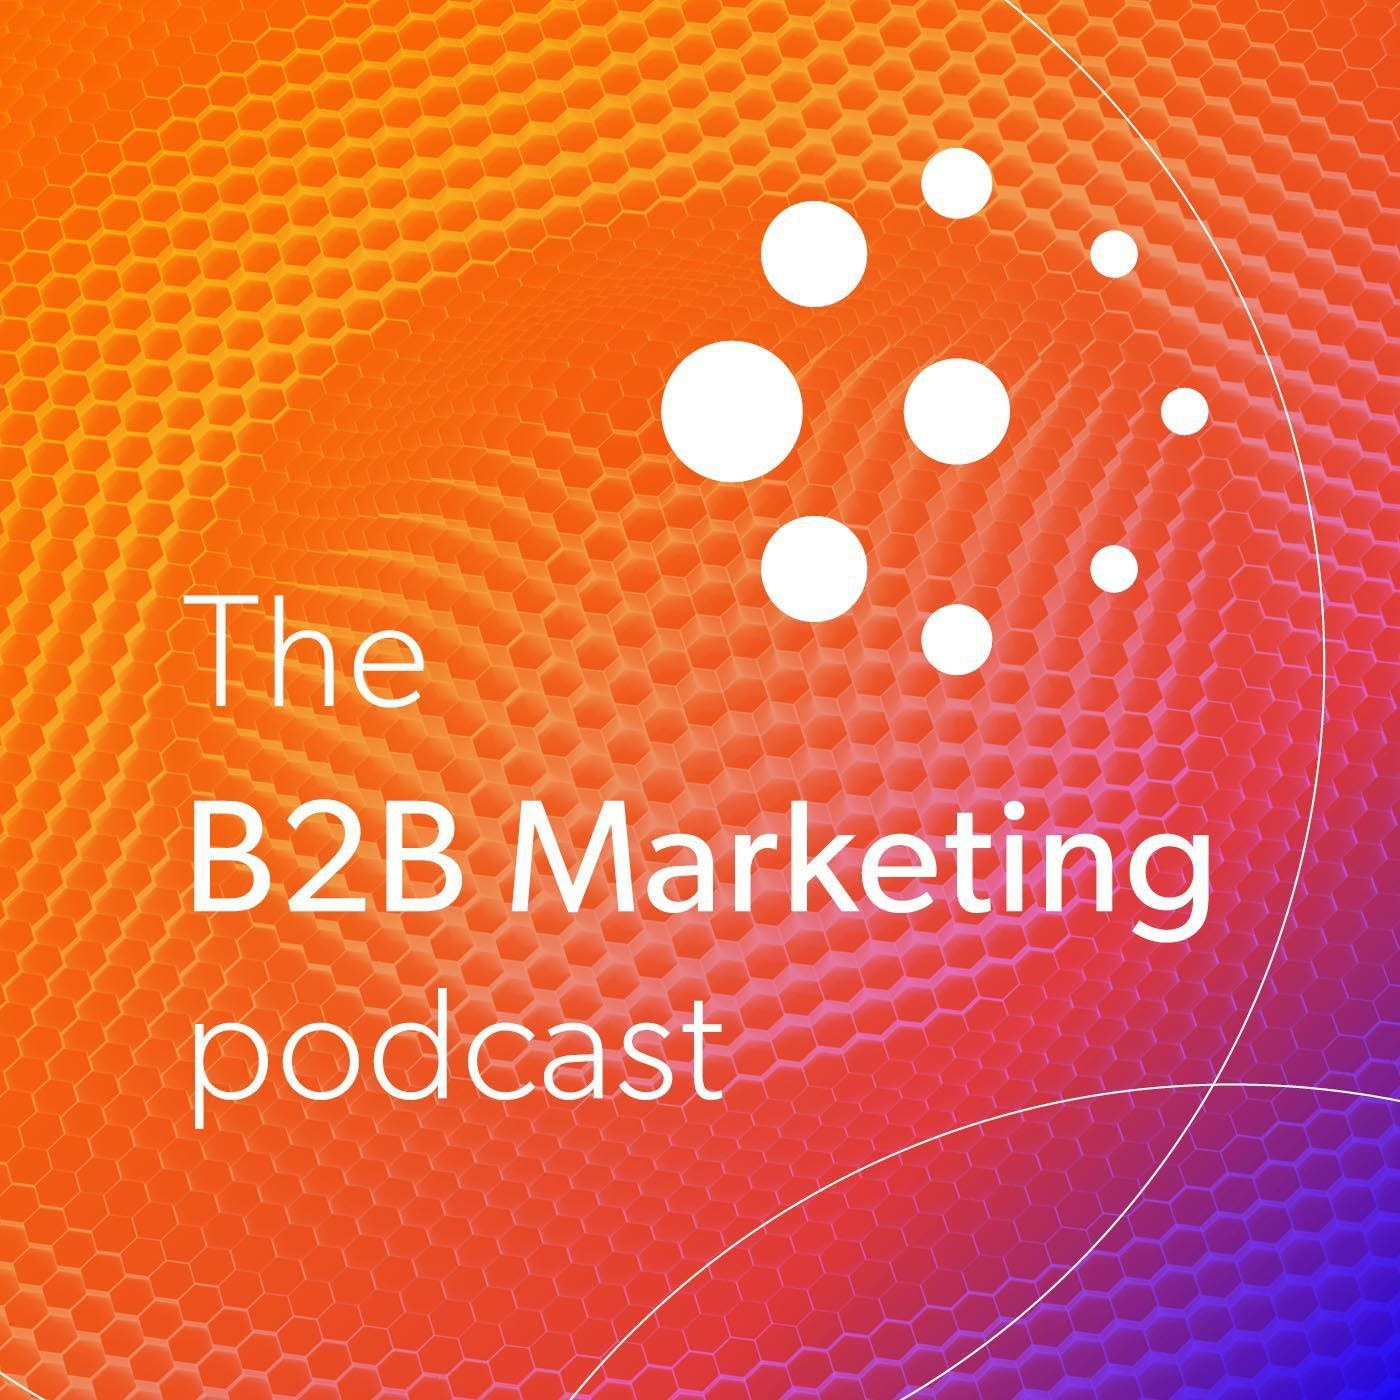 The B2B Marketing Podcast Digital Poster